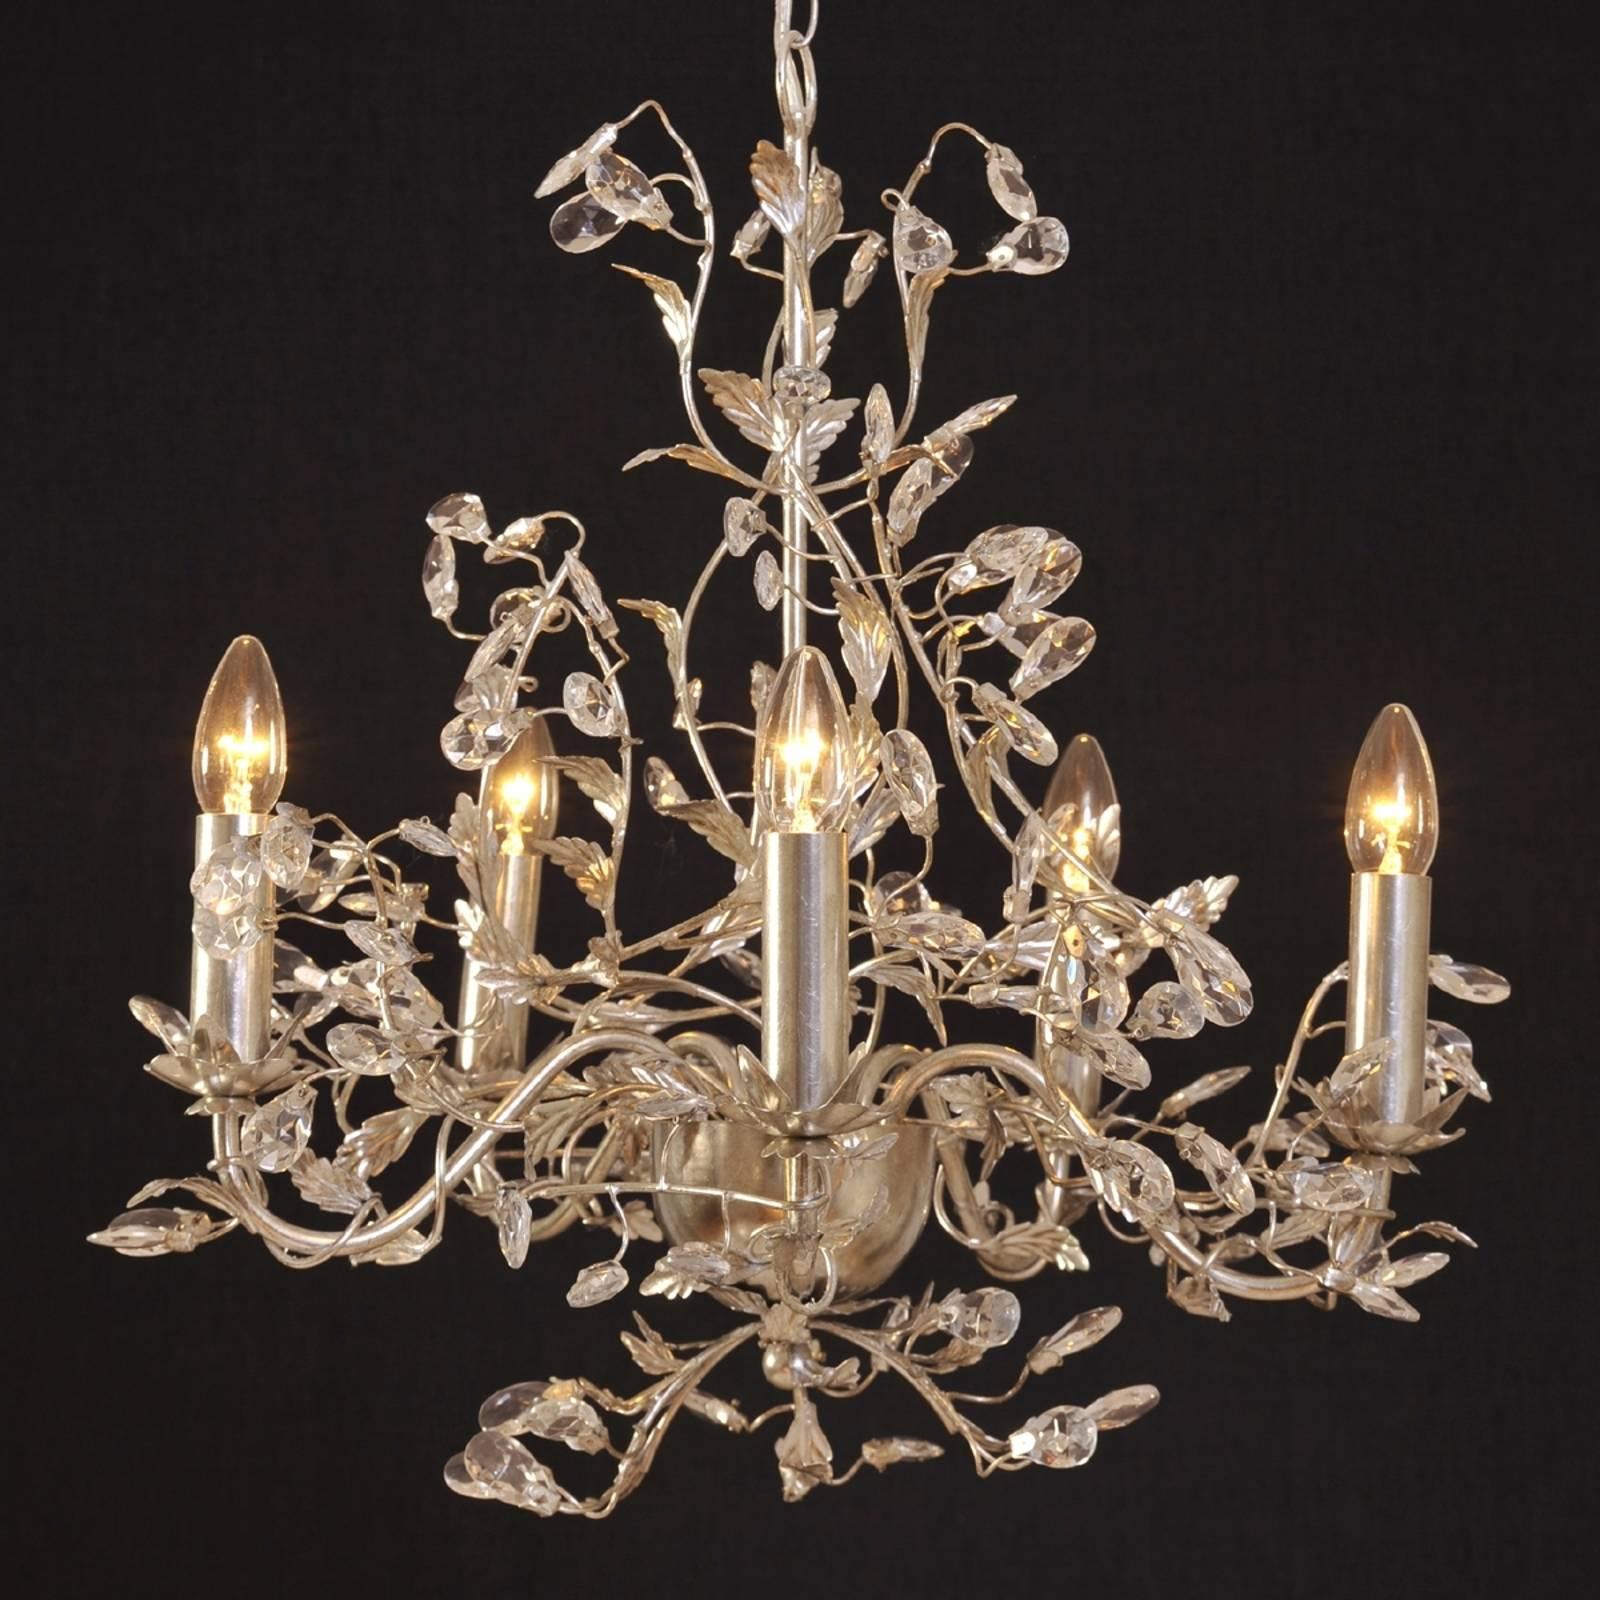 Exclusieve kroonluchter Buono 5-lichts zilver